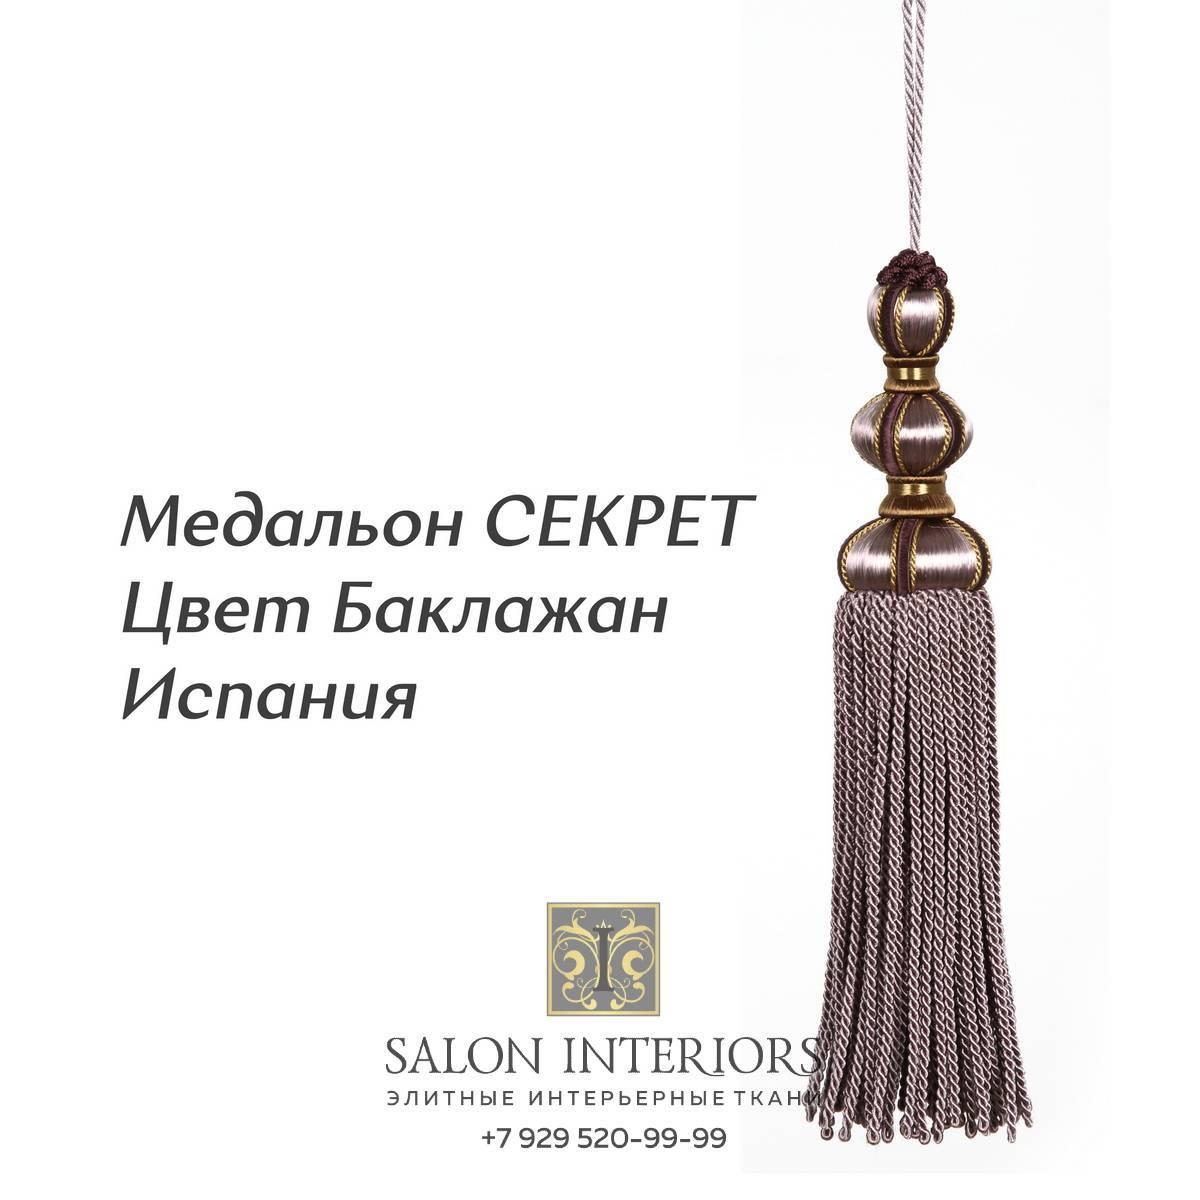 Баклажан Медальон